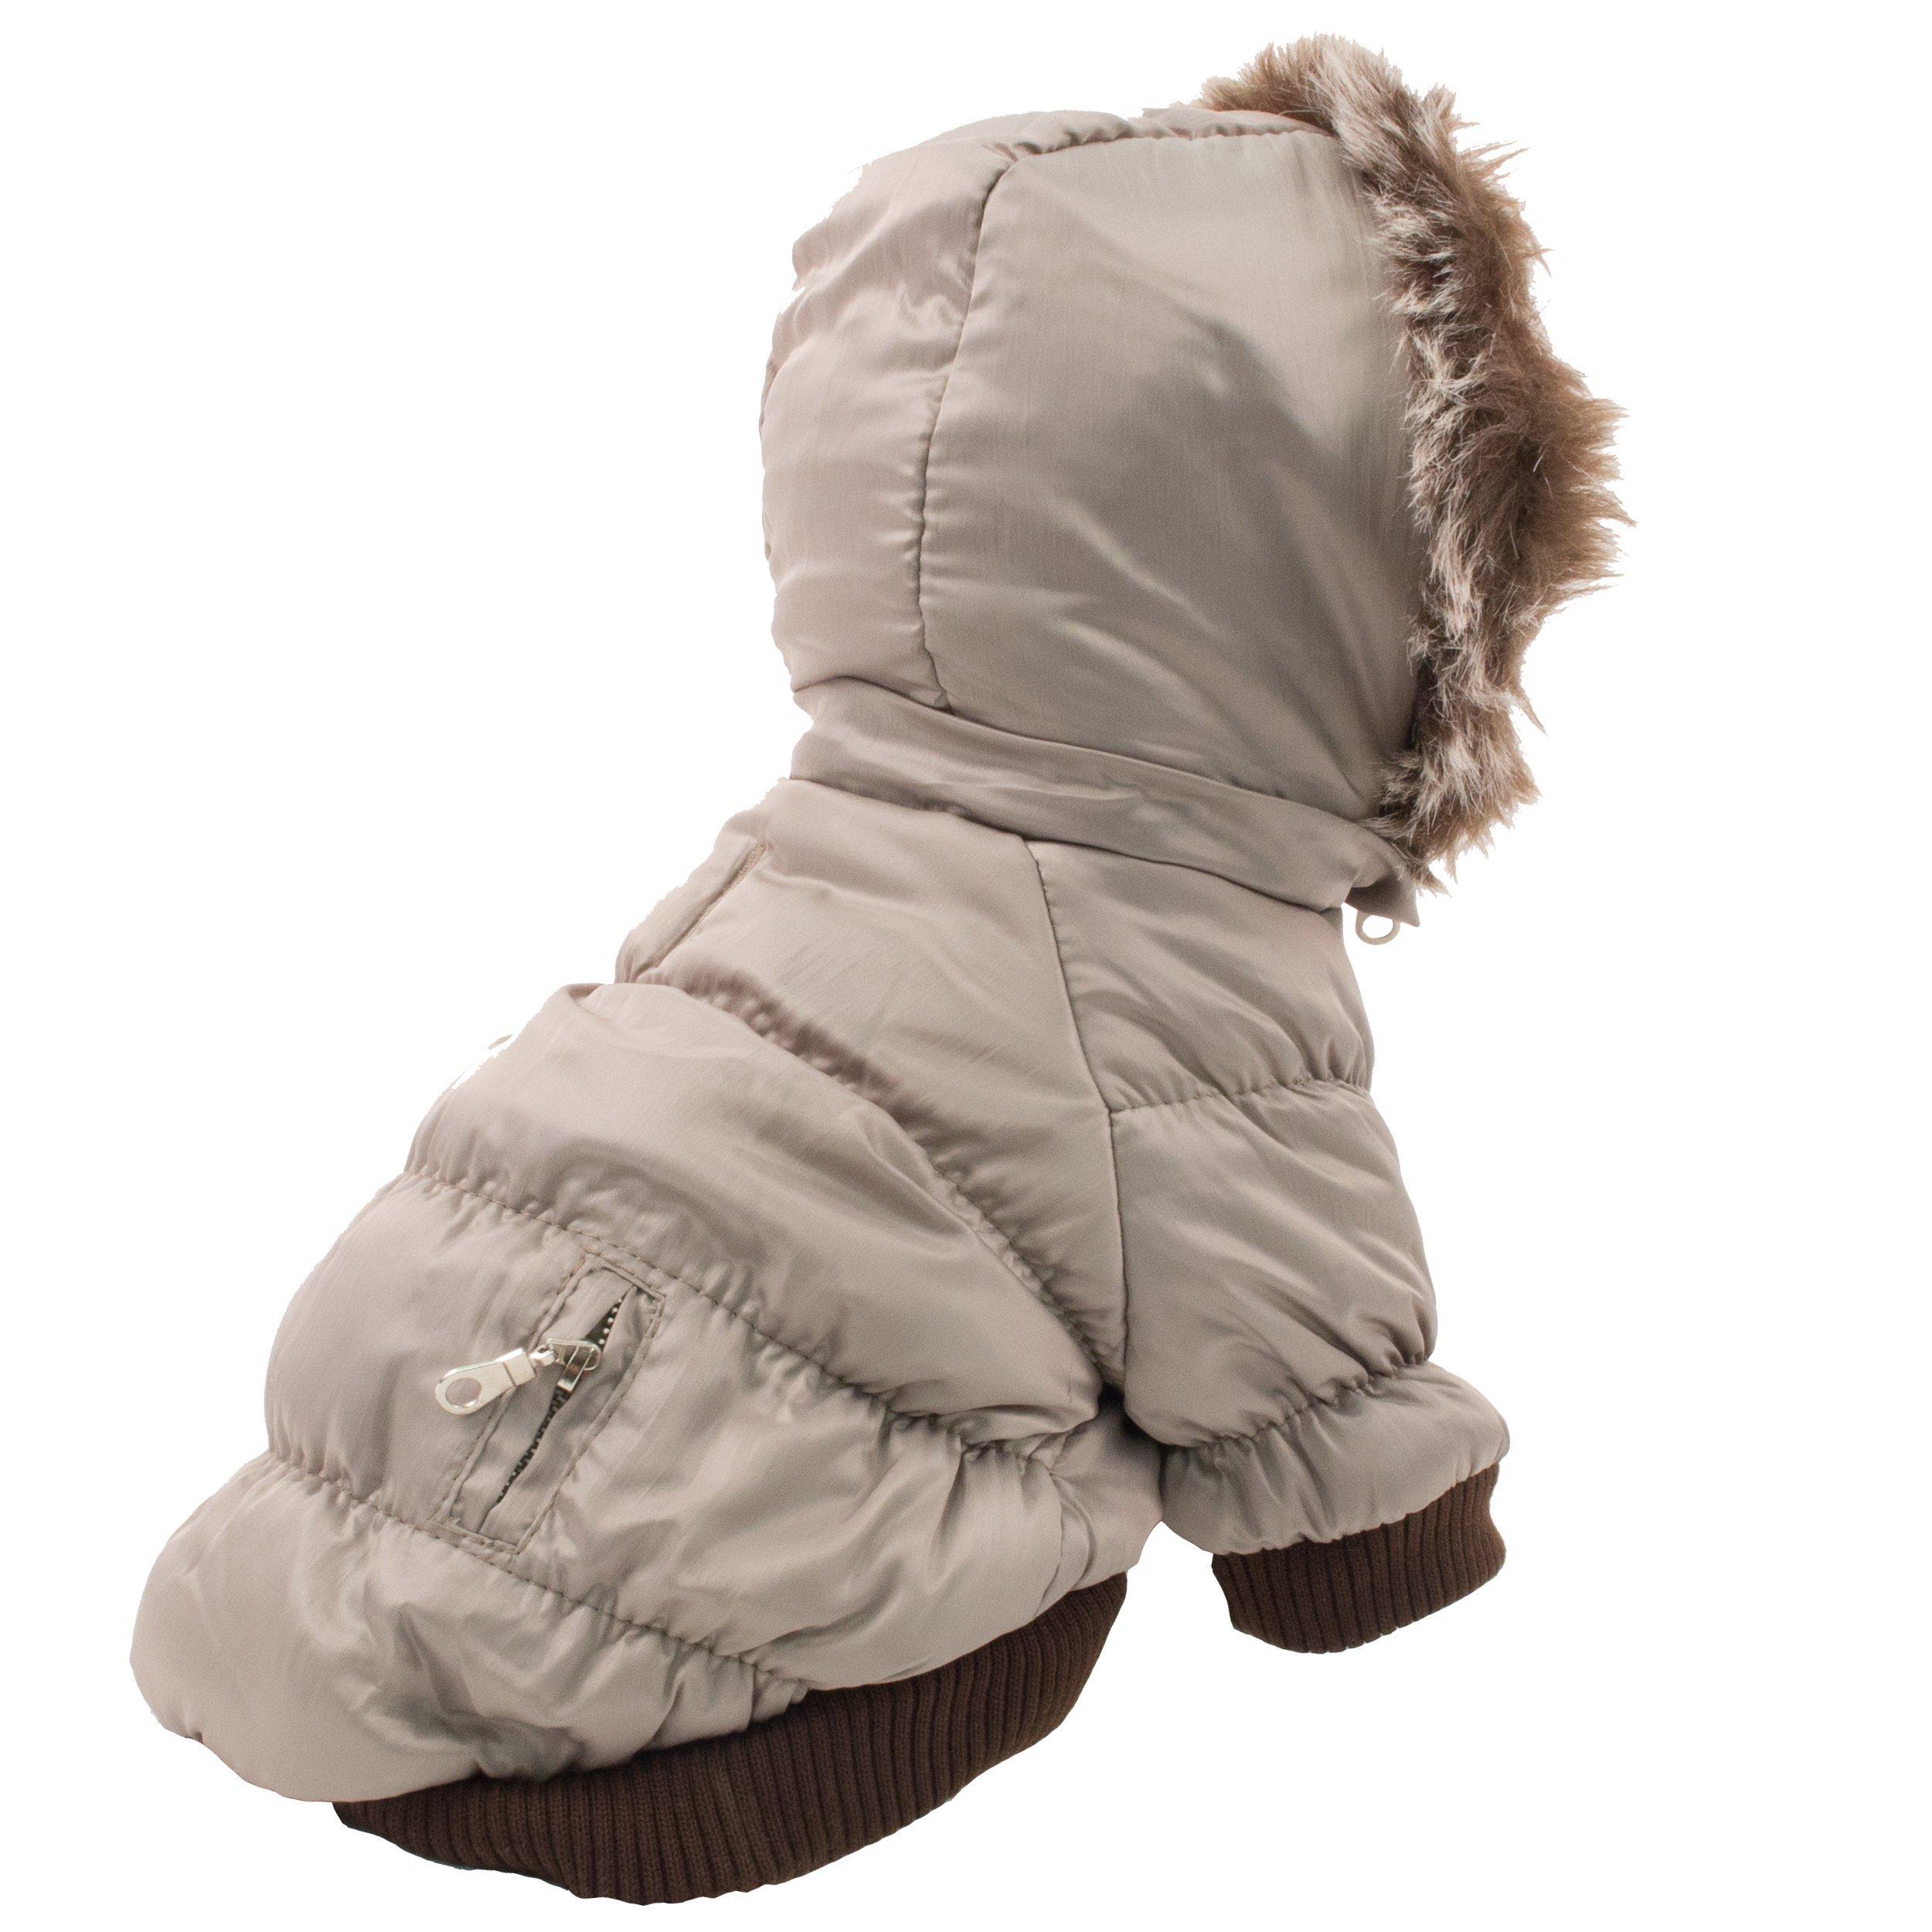 Pet Life Classic Metallic Fashion Pet Dog Coat Jacket Parka w/3M Insulation and Removable Hood, X-Large, Metallic Grey